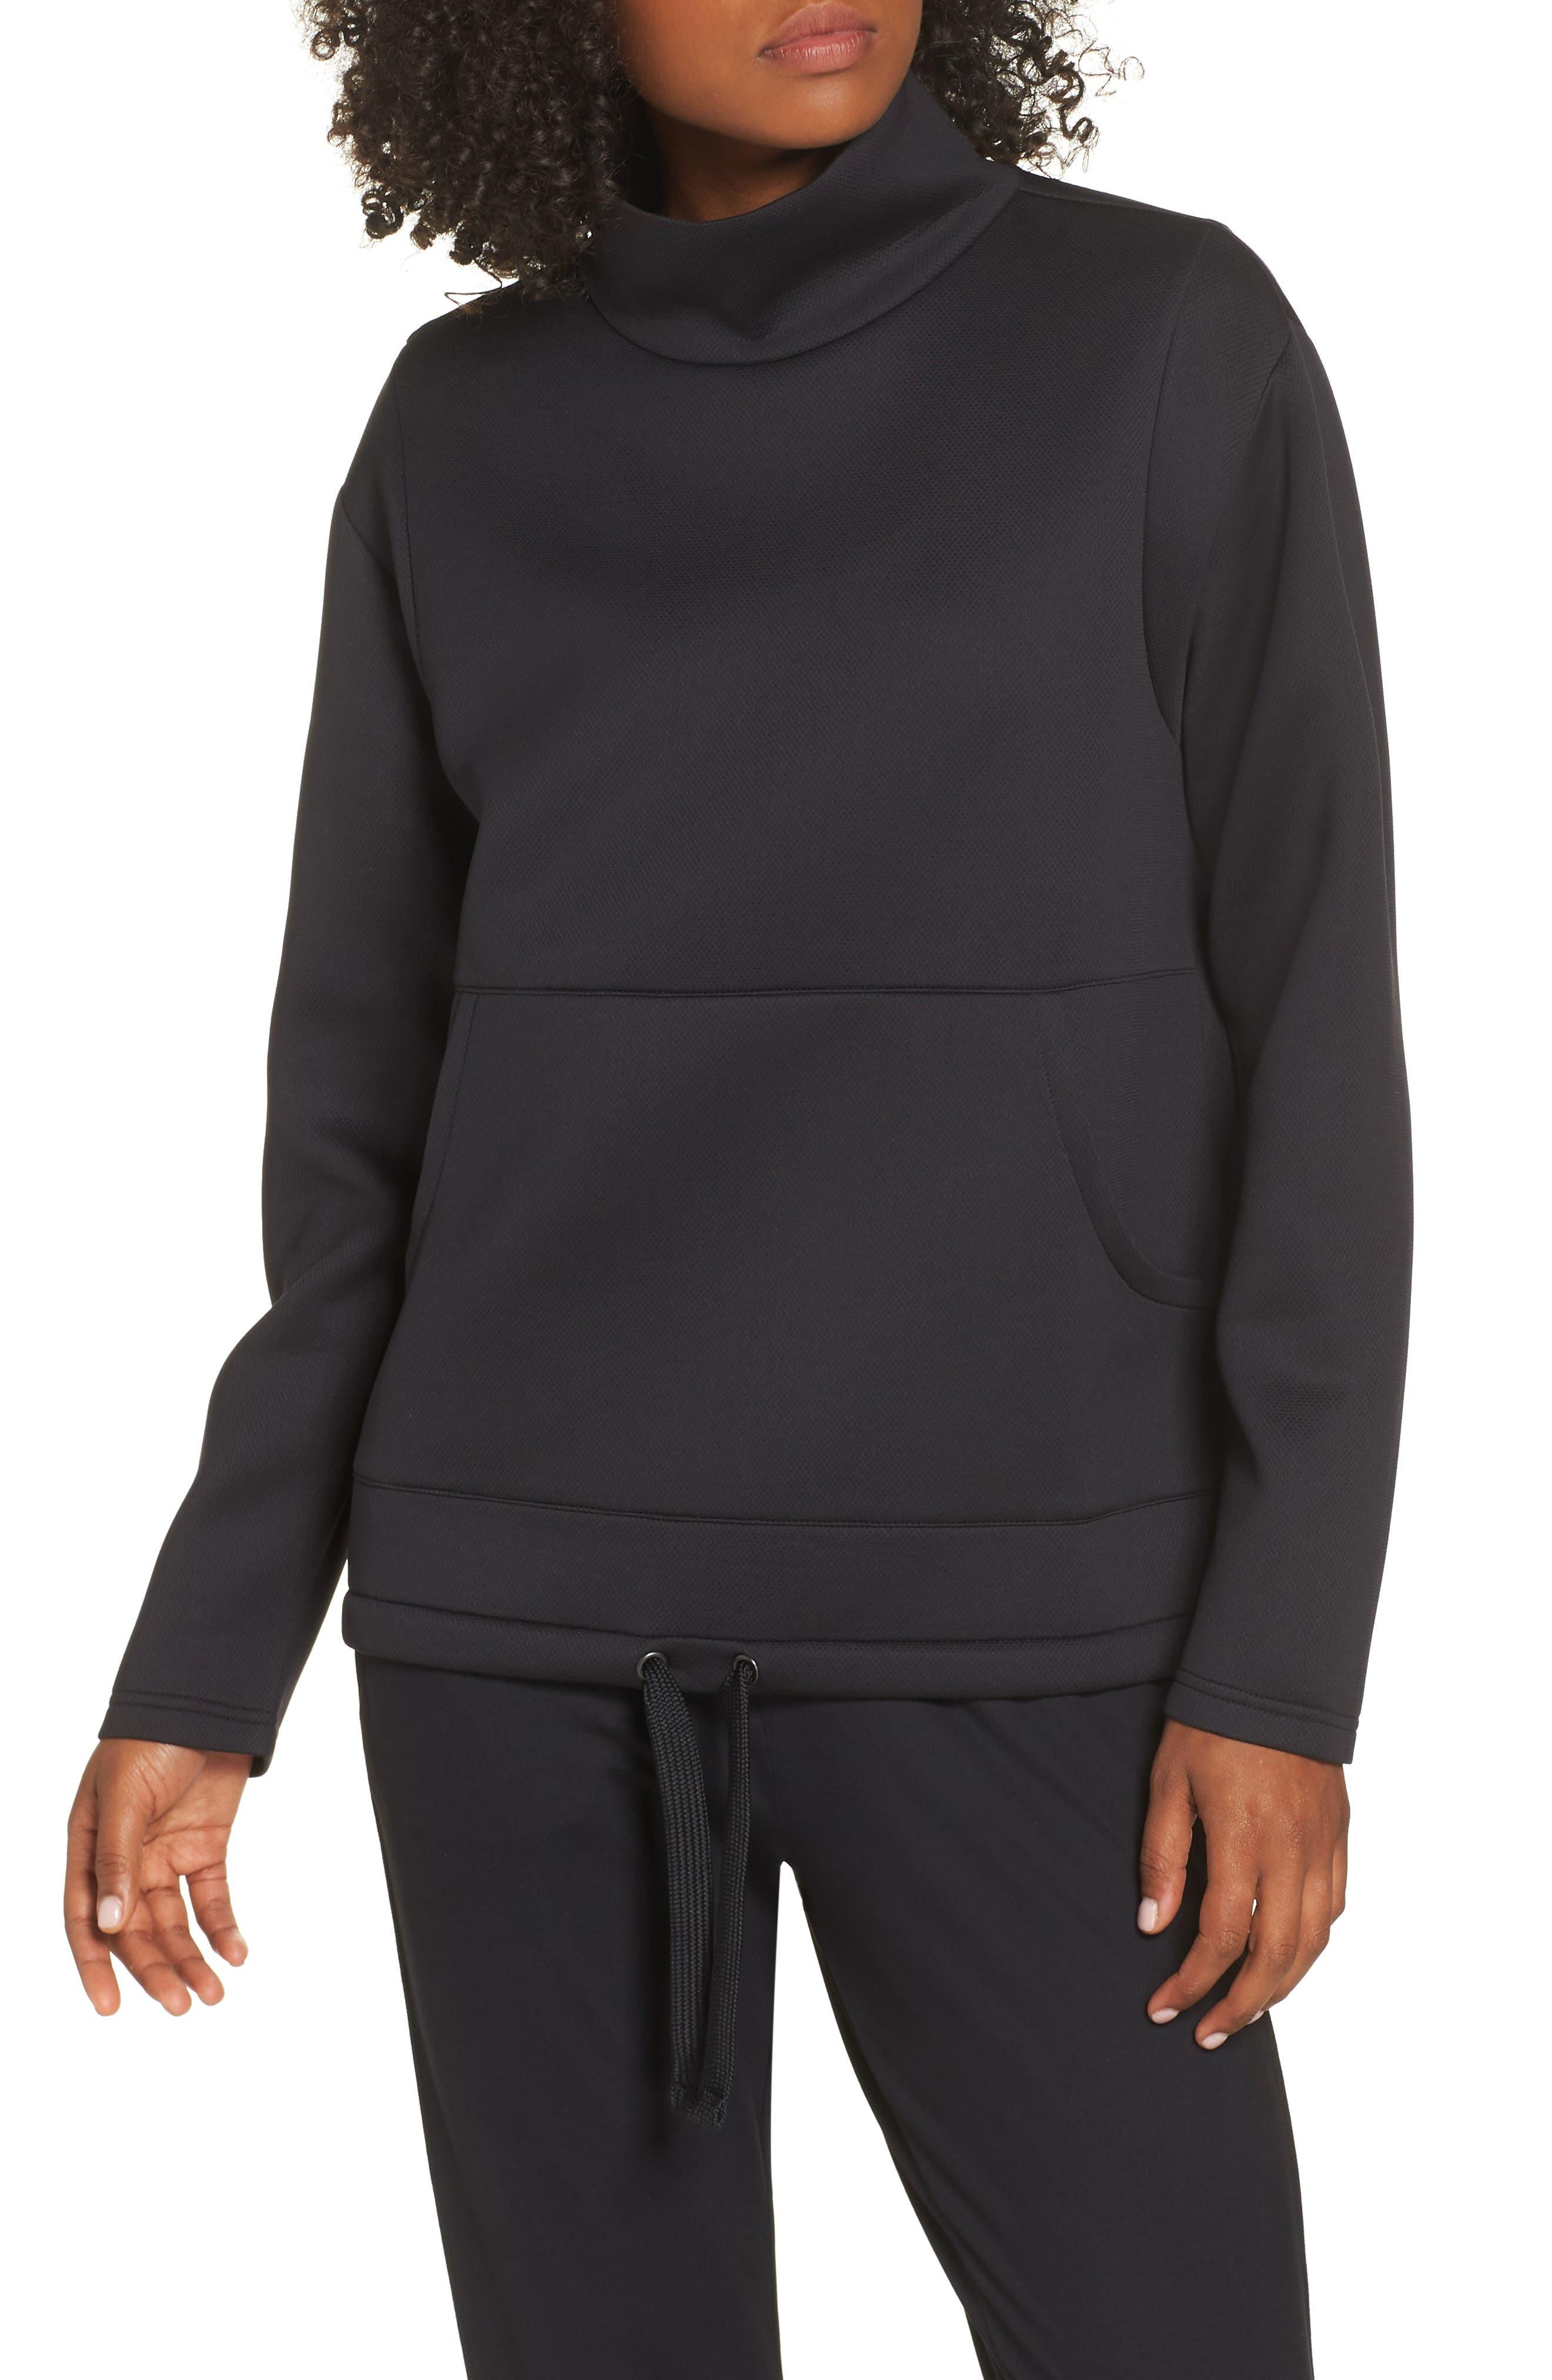 All About It Funnel Neck Sweatshirt,                             Main thumbnail 1, color,                             BLACK